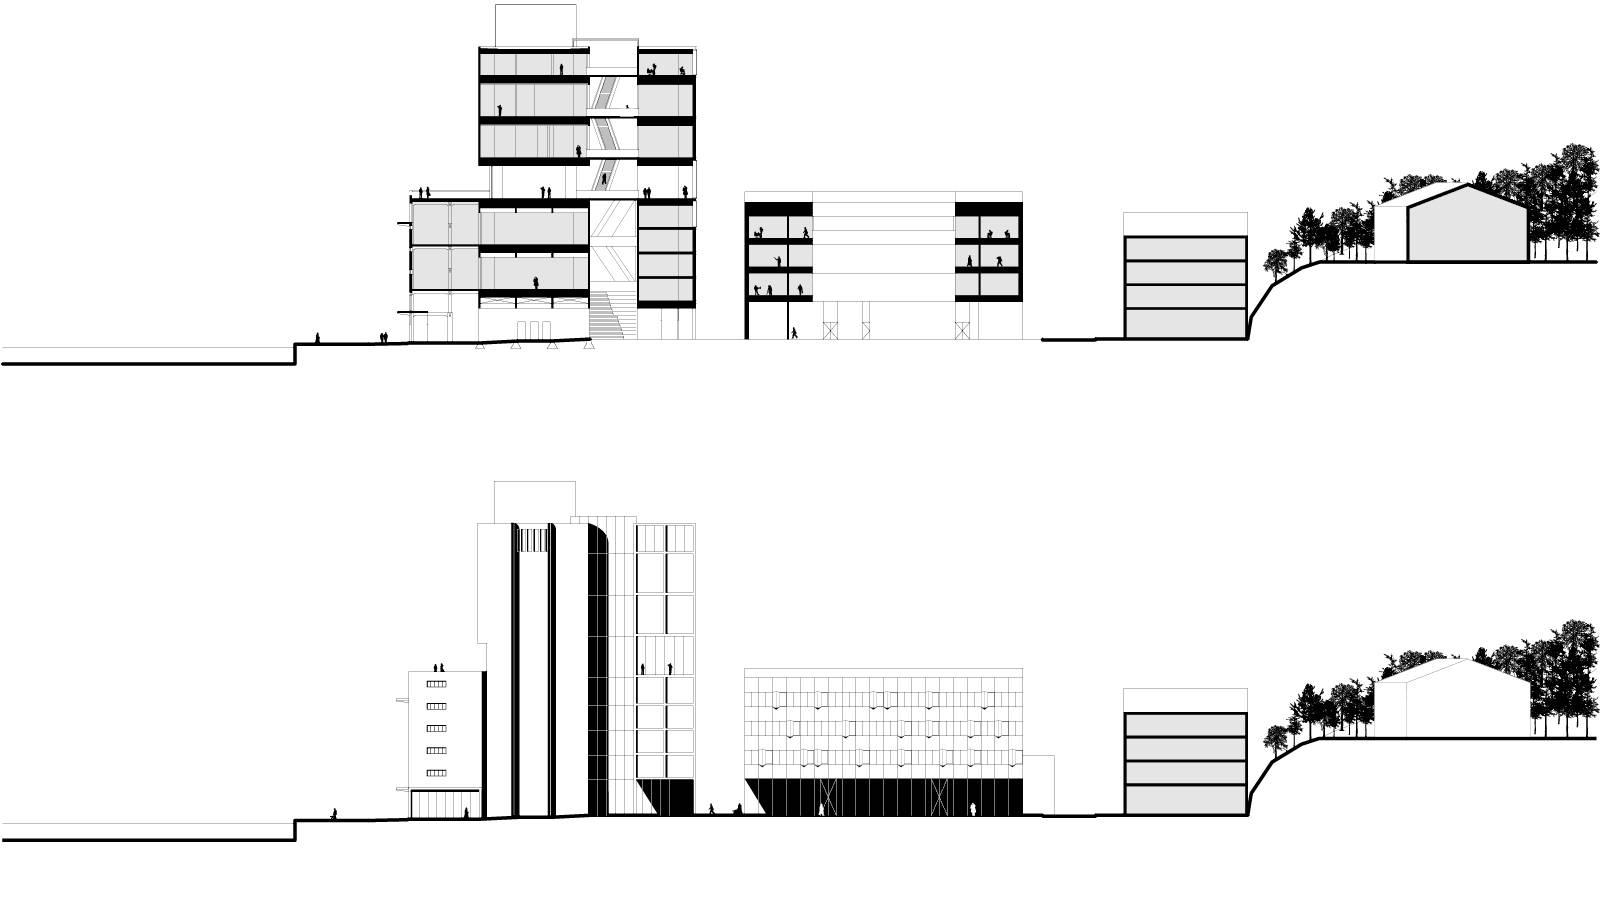 SECTION ACROSS SITE - ART SILO AND ART SCHOOL - Kunstsilo - SPOL Architects